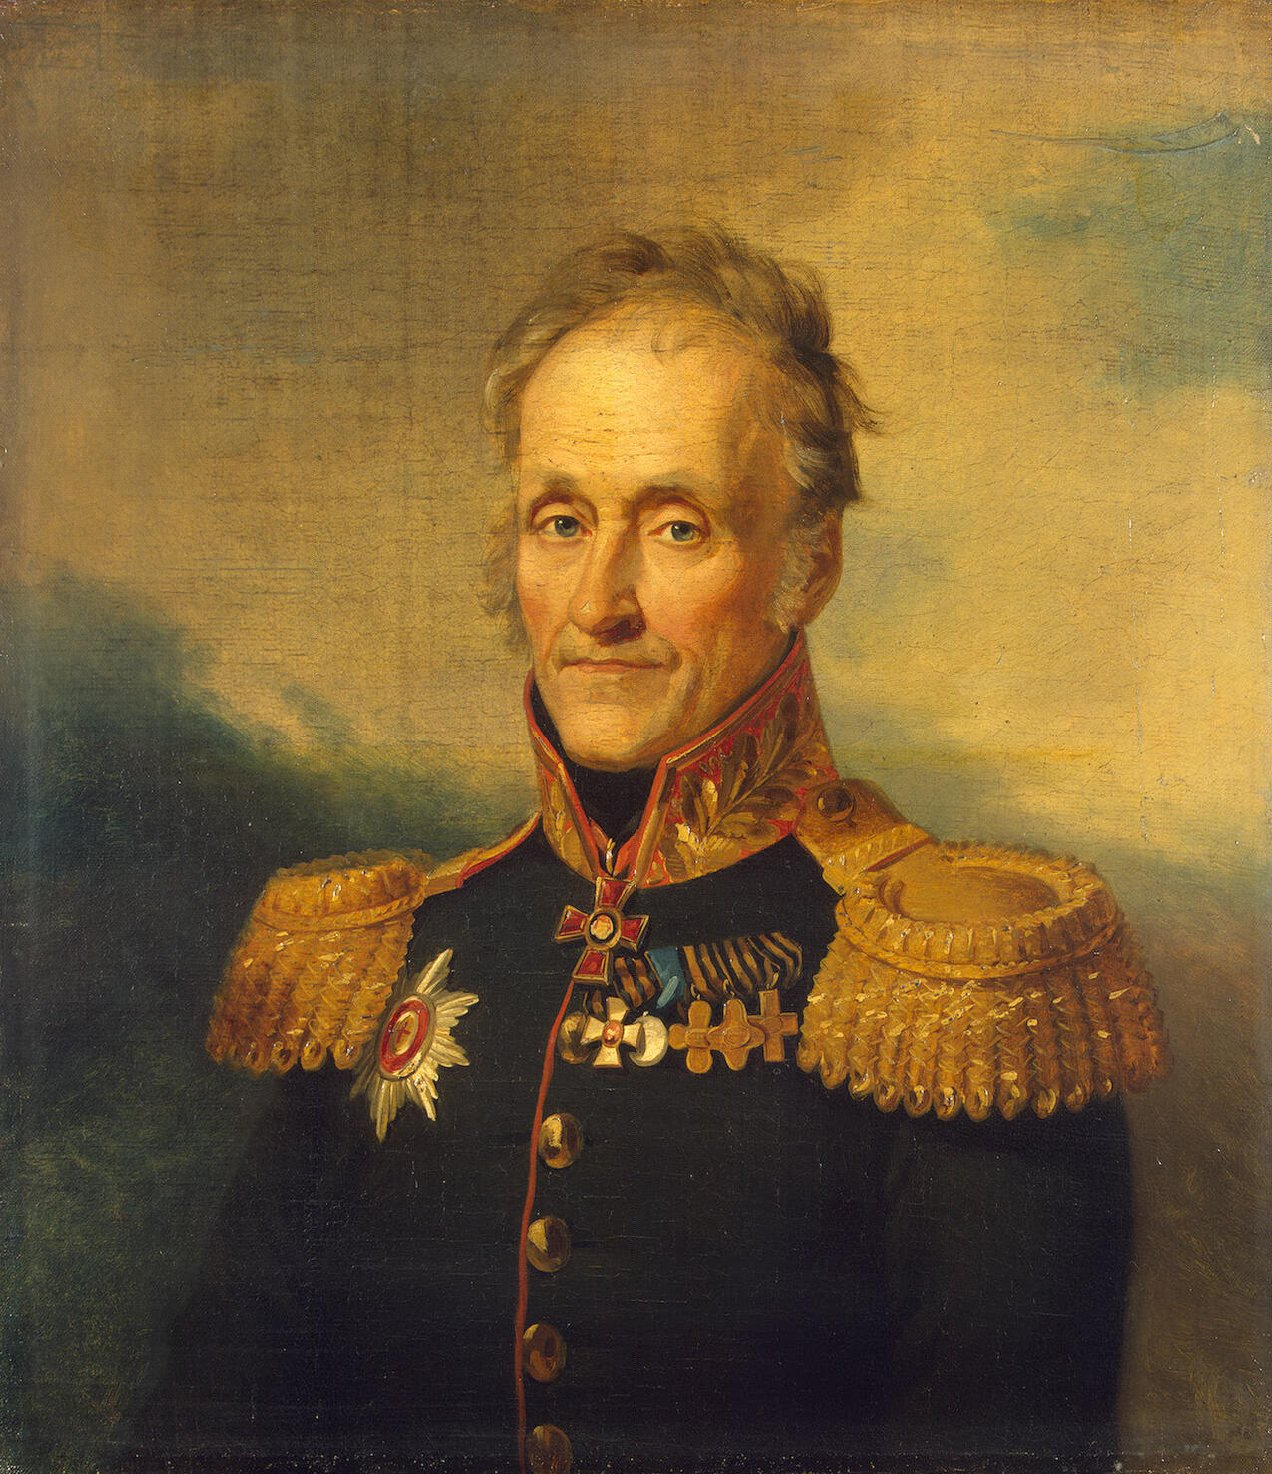 Сандерс, Фёдор Иванович